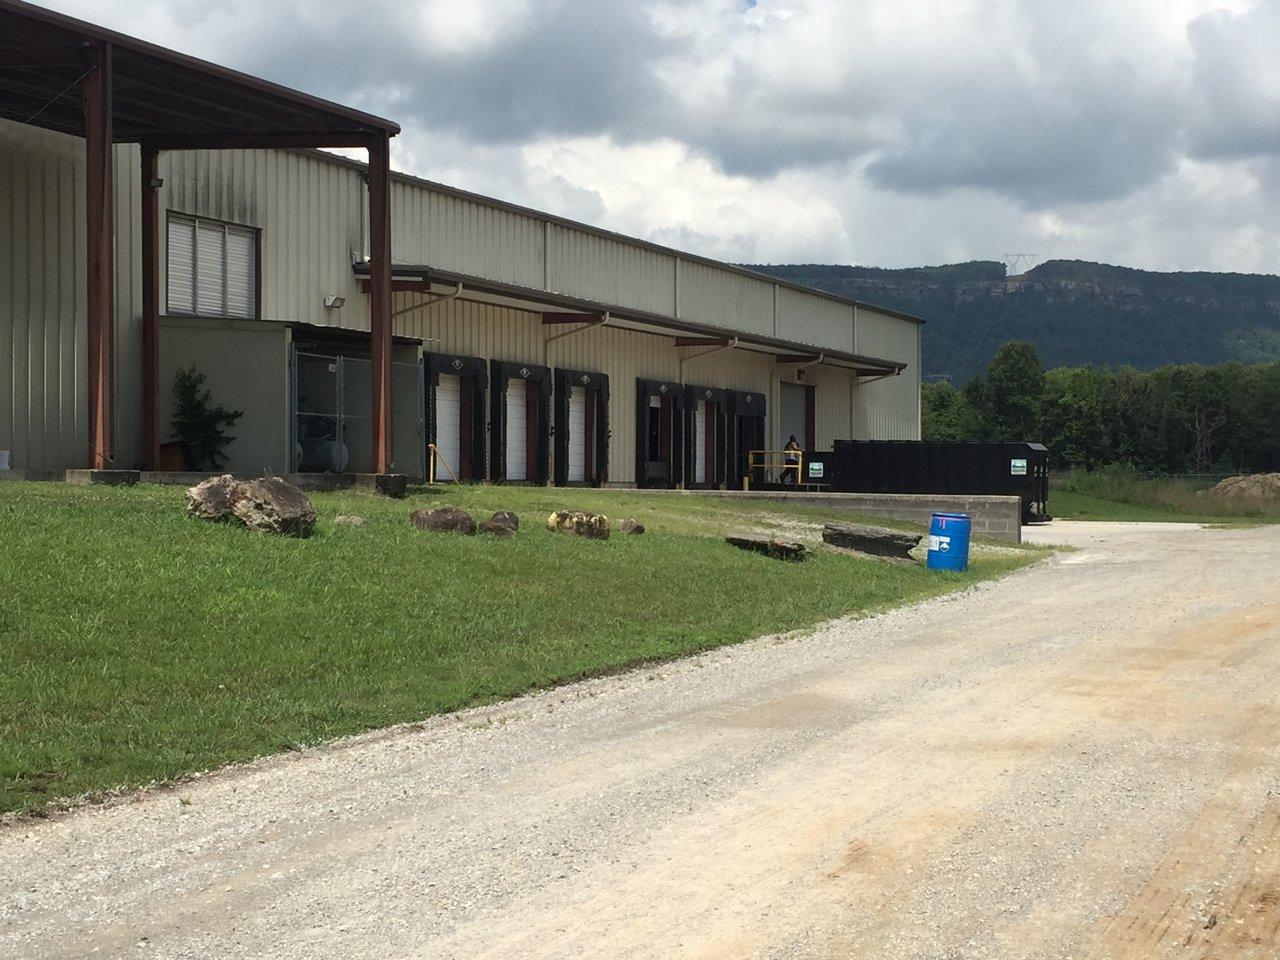 238 Industrial Park Dr, Soddy Daisy, TN, 37379